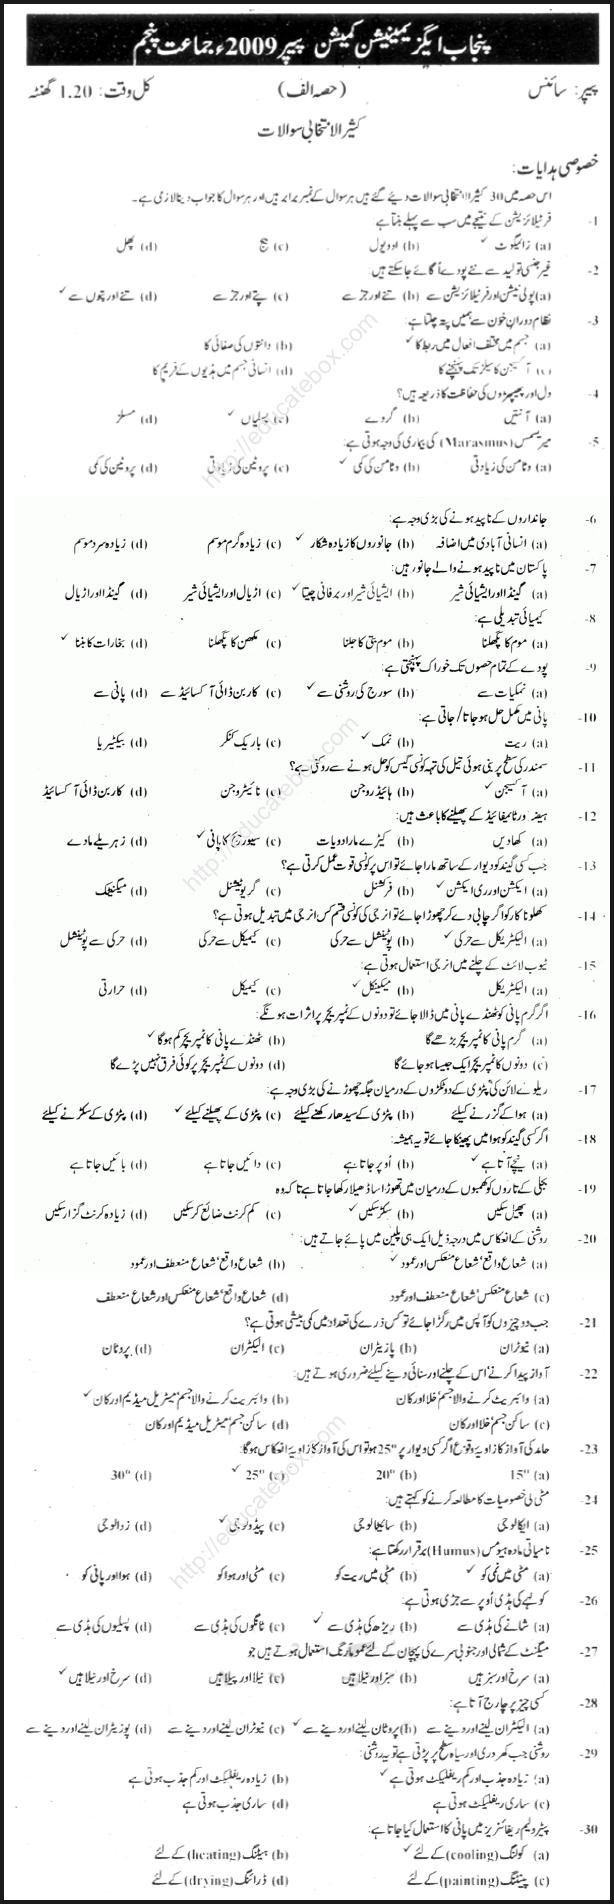 Past Paper - Class 5 Science Punjab Education Commission 2009